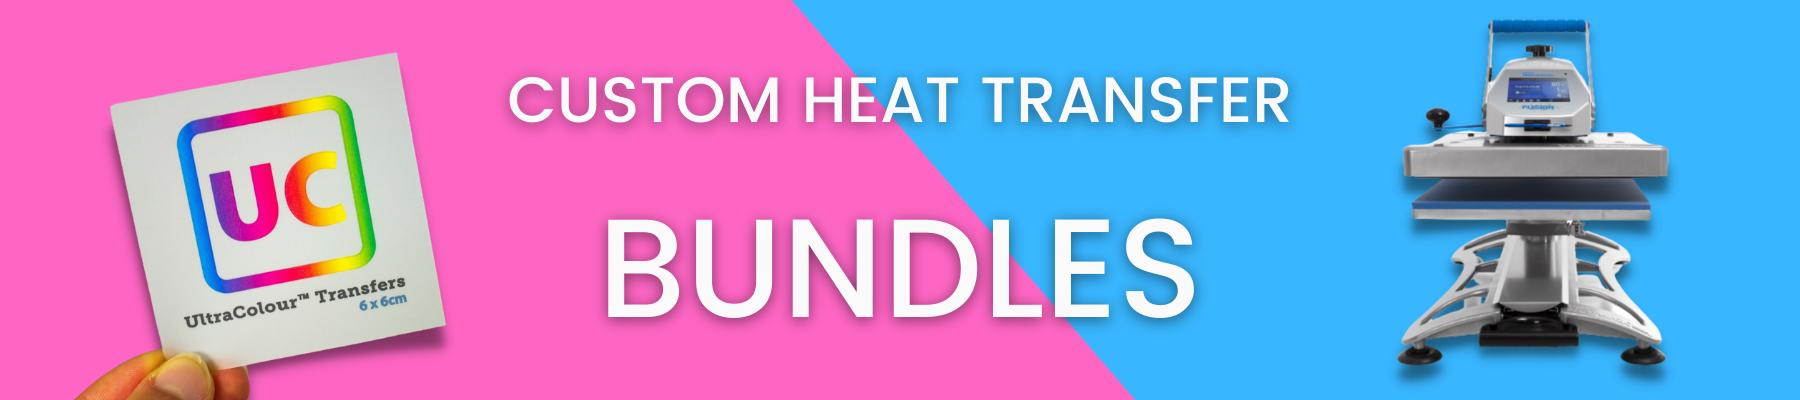 Custom Heat Transfer Bundles